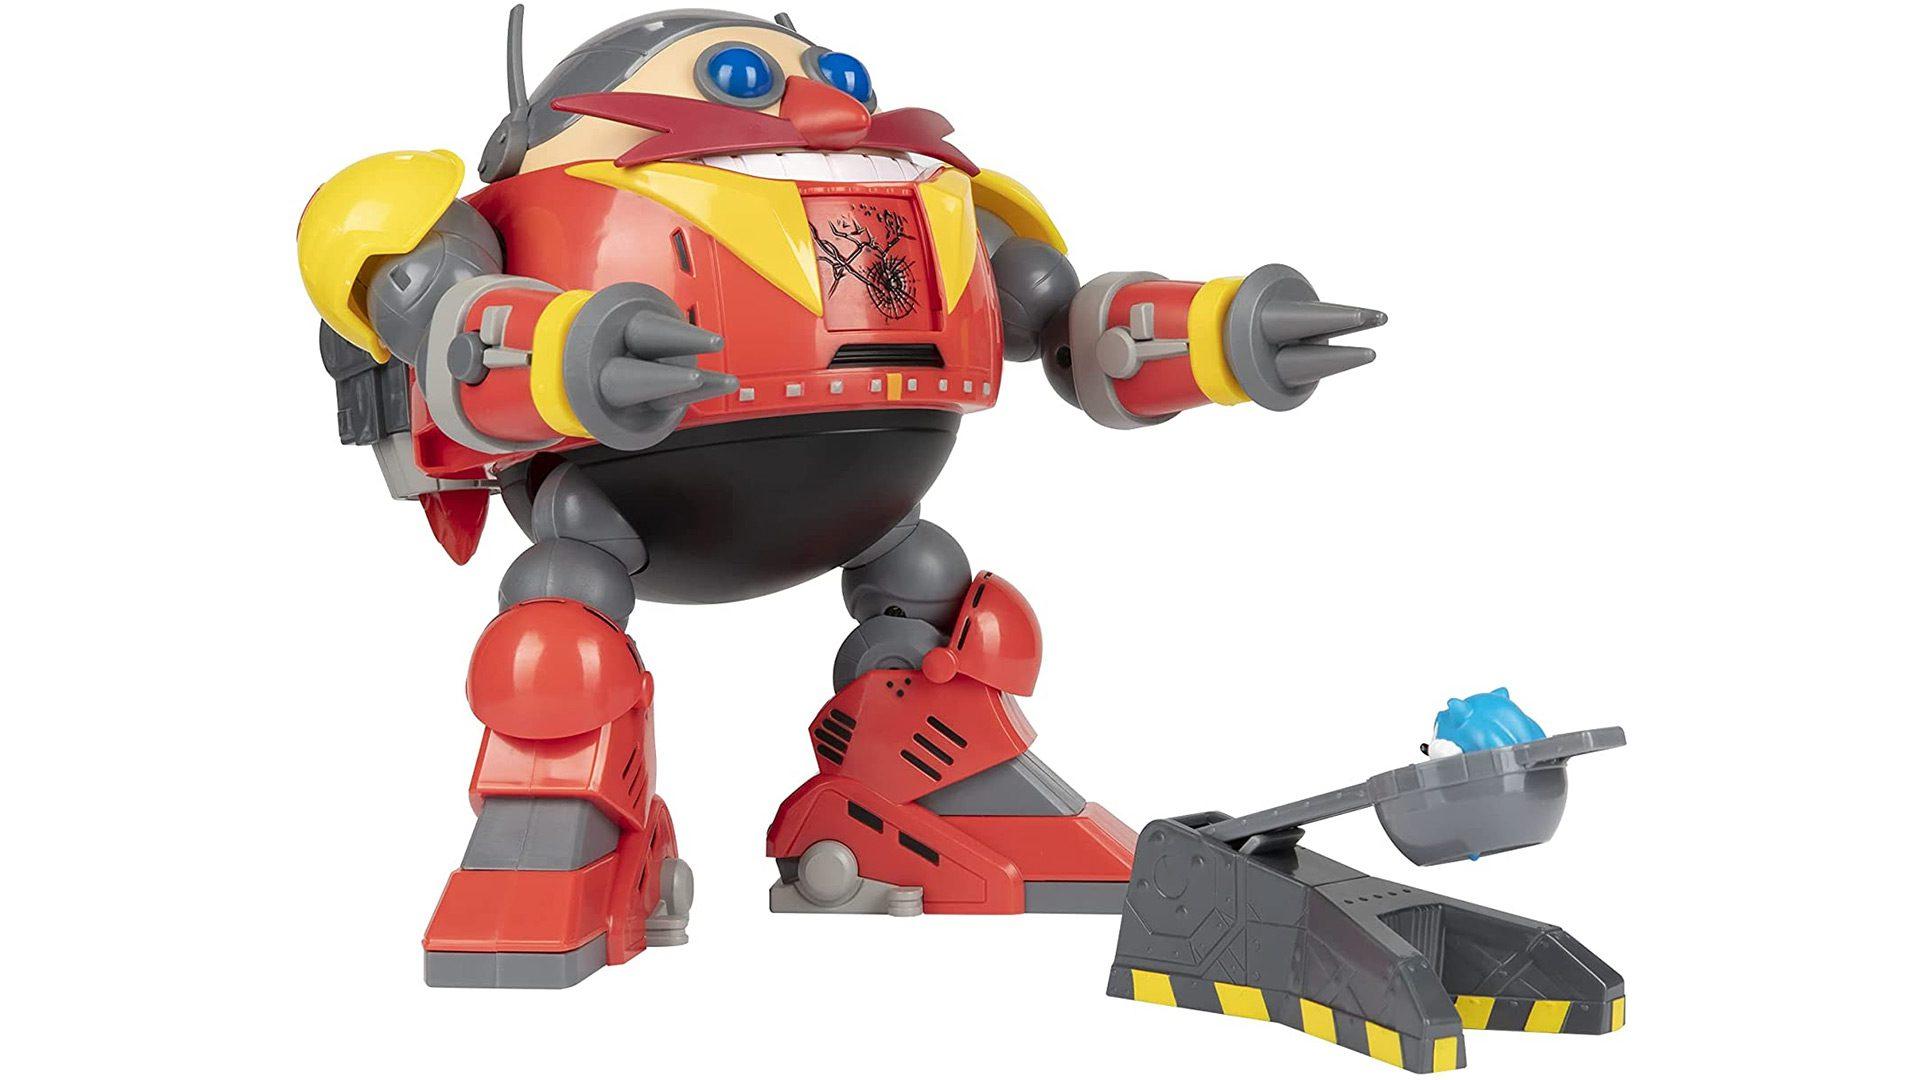 Giant Eggman Robot Battle Set with Sonic catapult